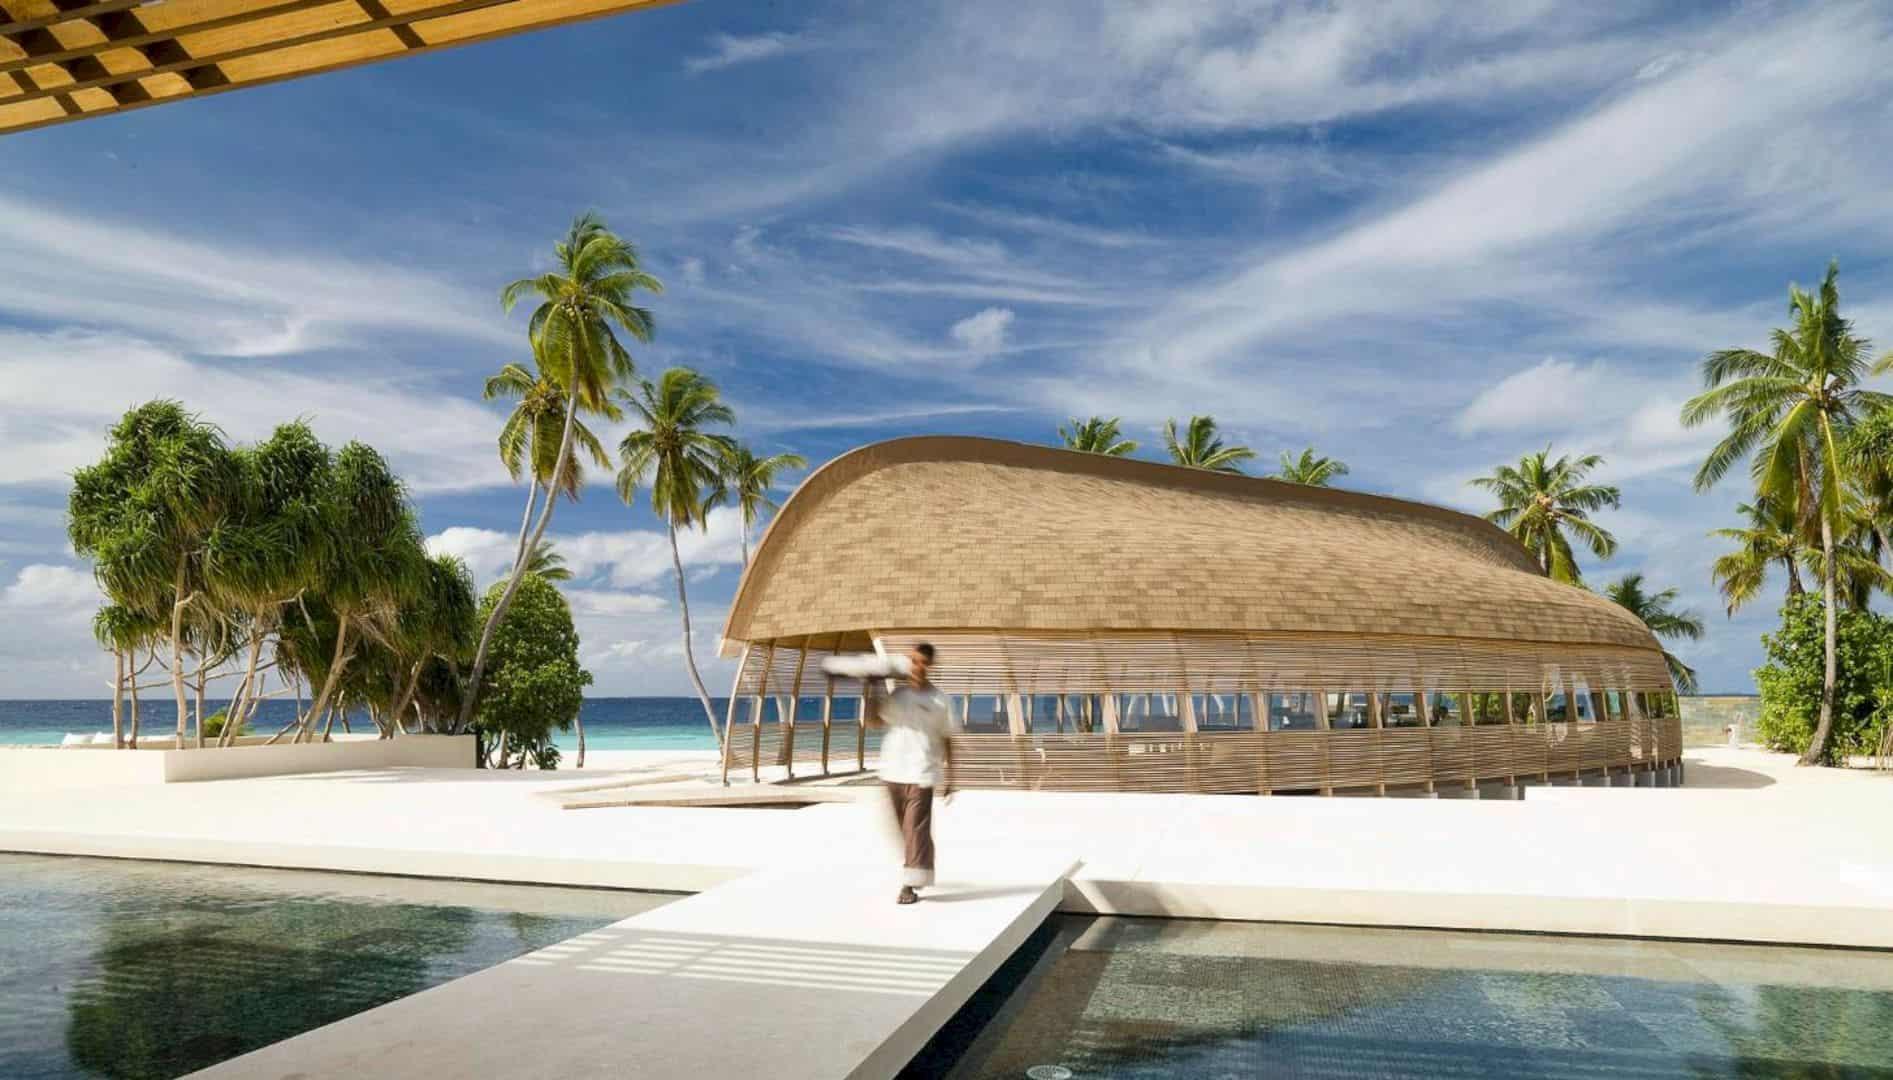 Park Hyatt Maldives: The First Resort with Green Globe Certification in Maldives